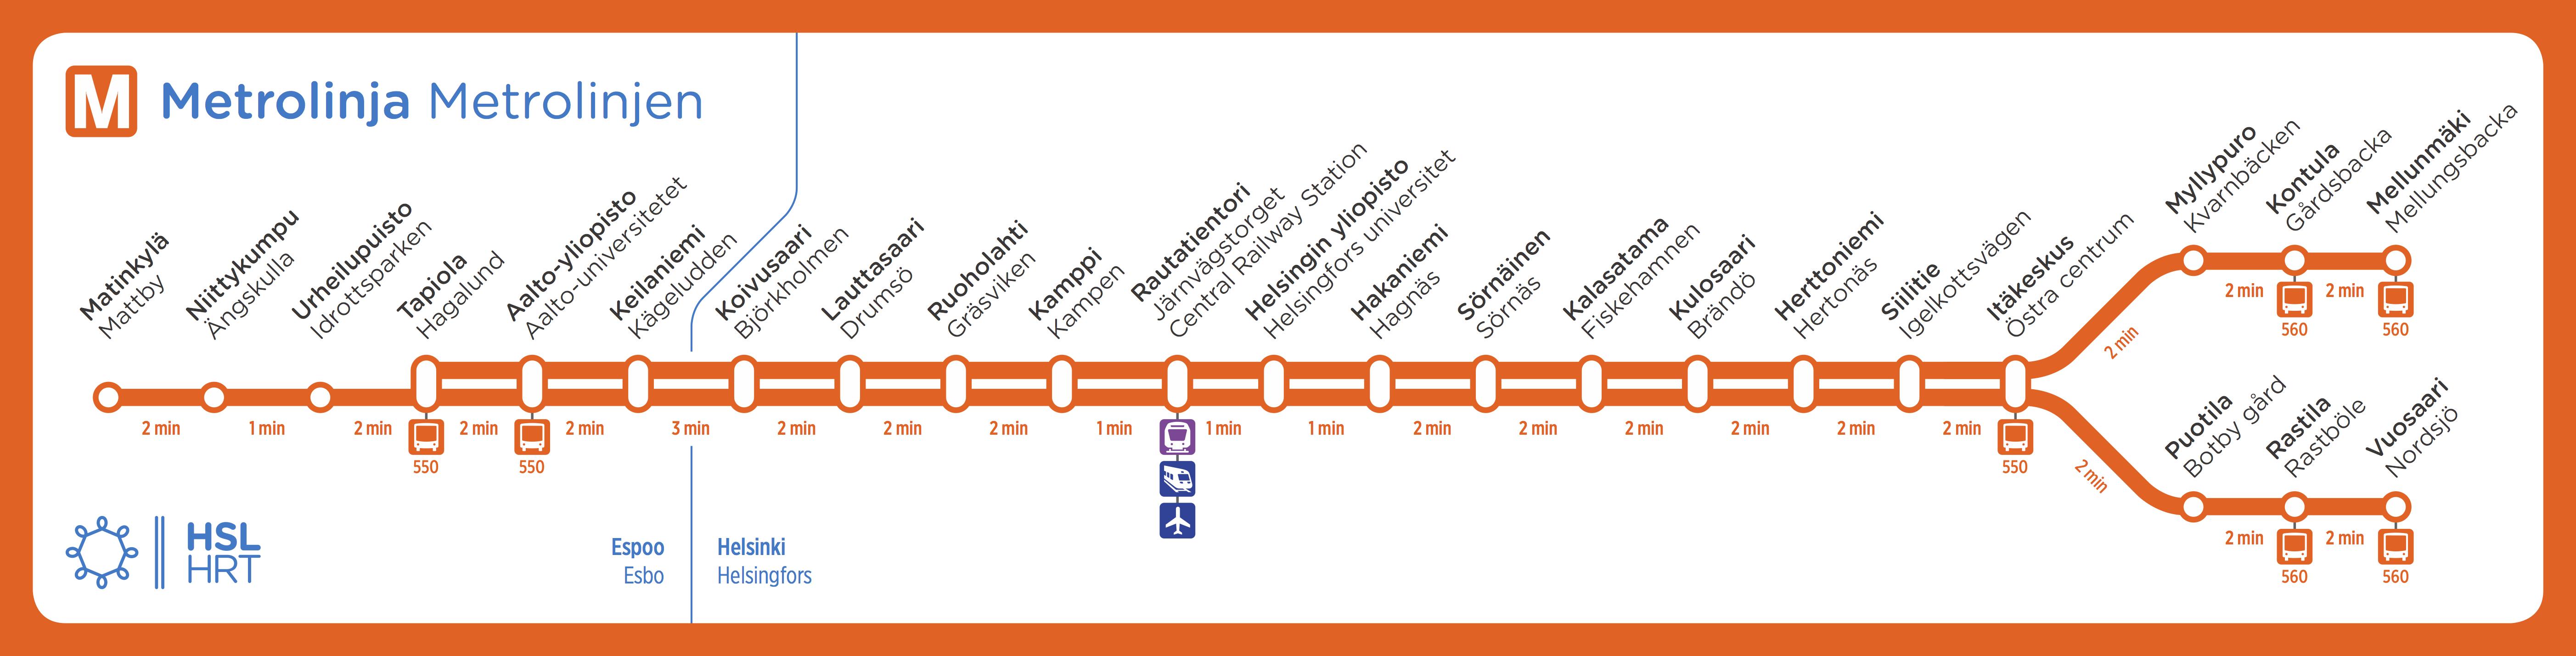 Metro Helsinki Kartta